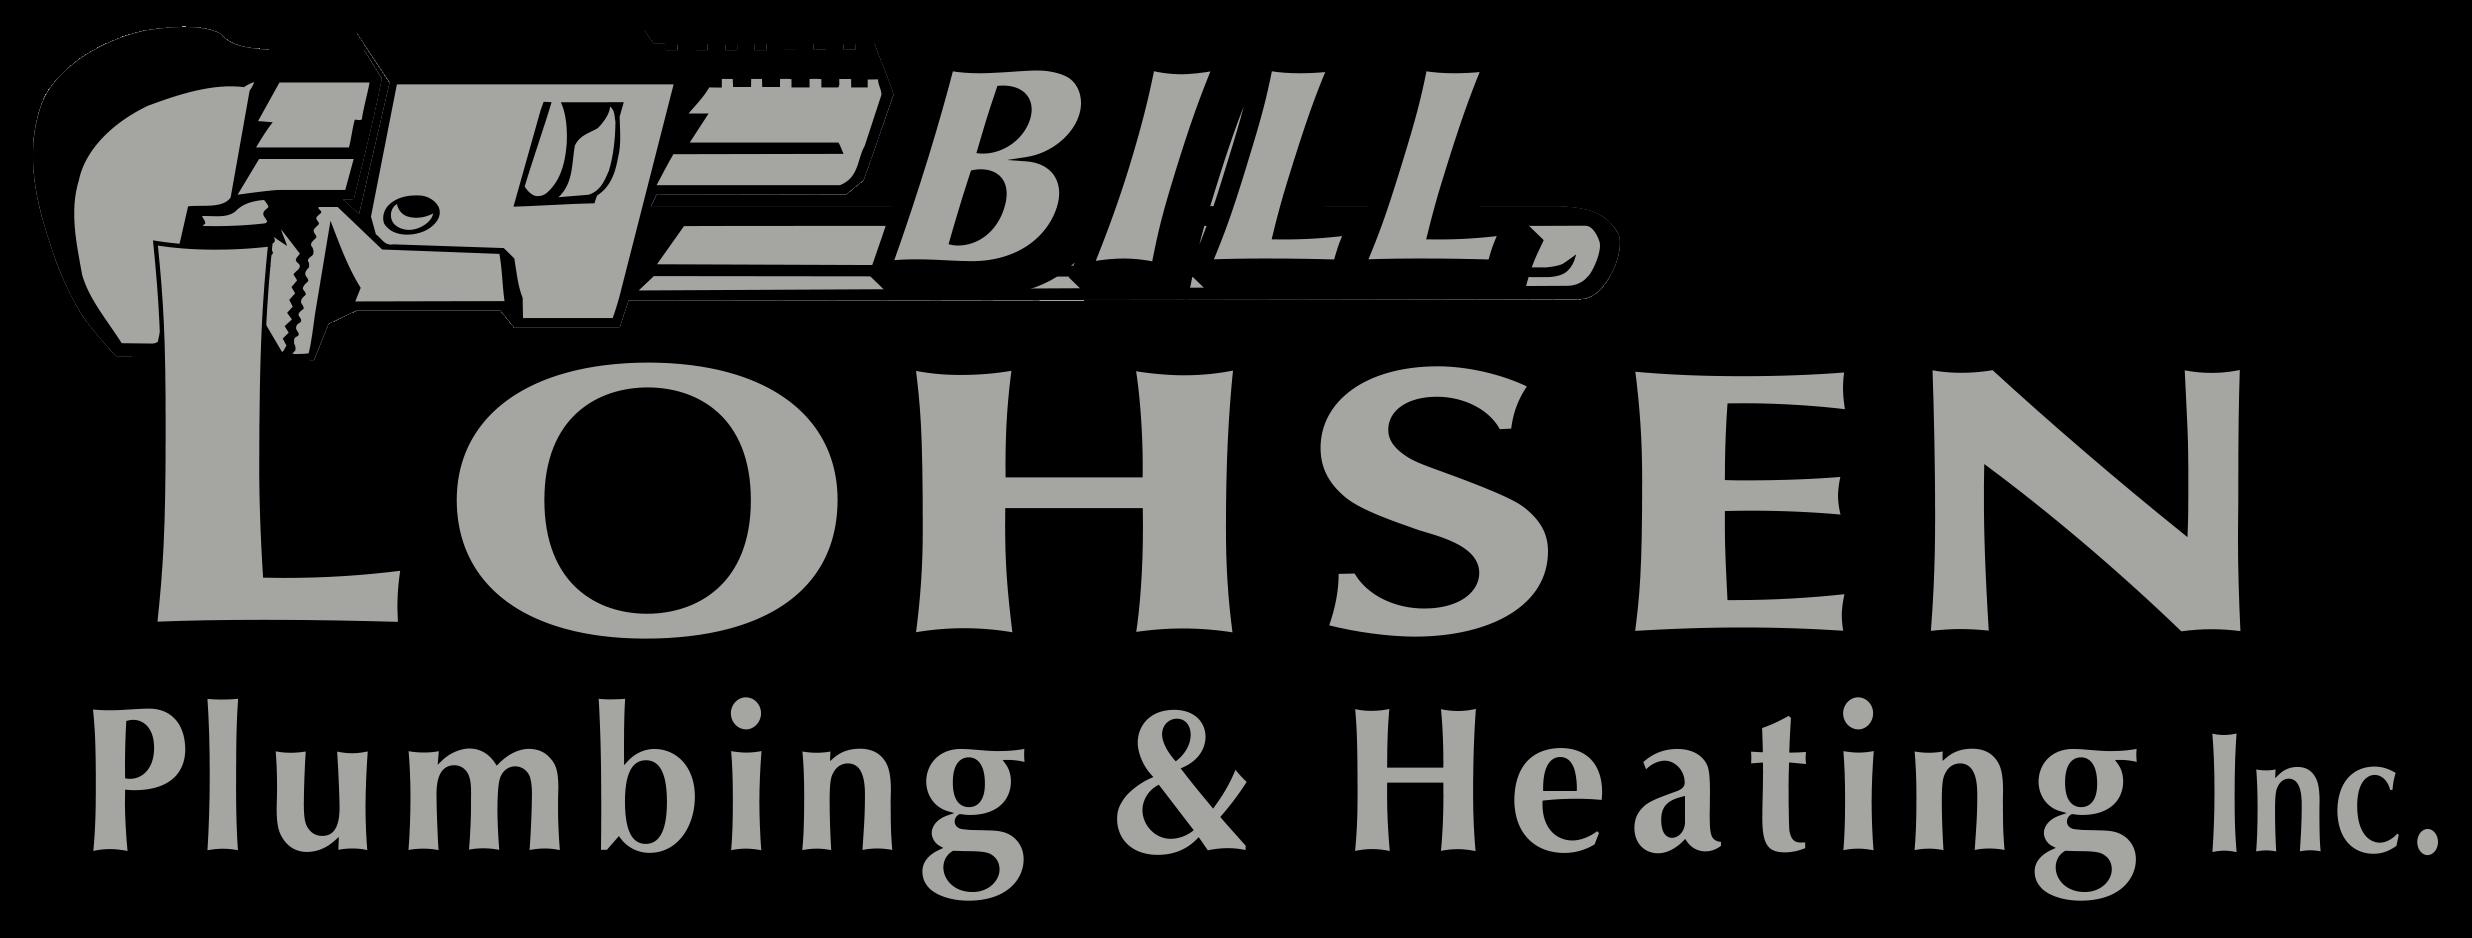 Bill Lohsen Plumbing and Heating, Inc.